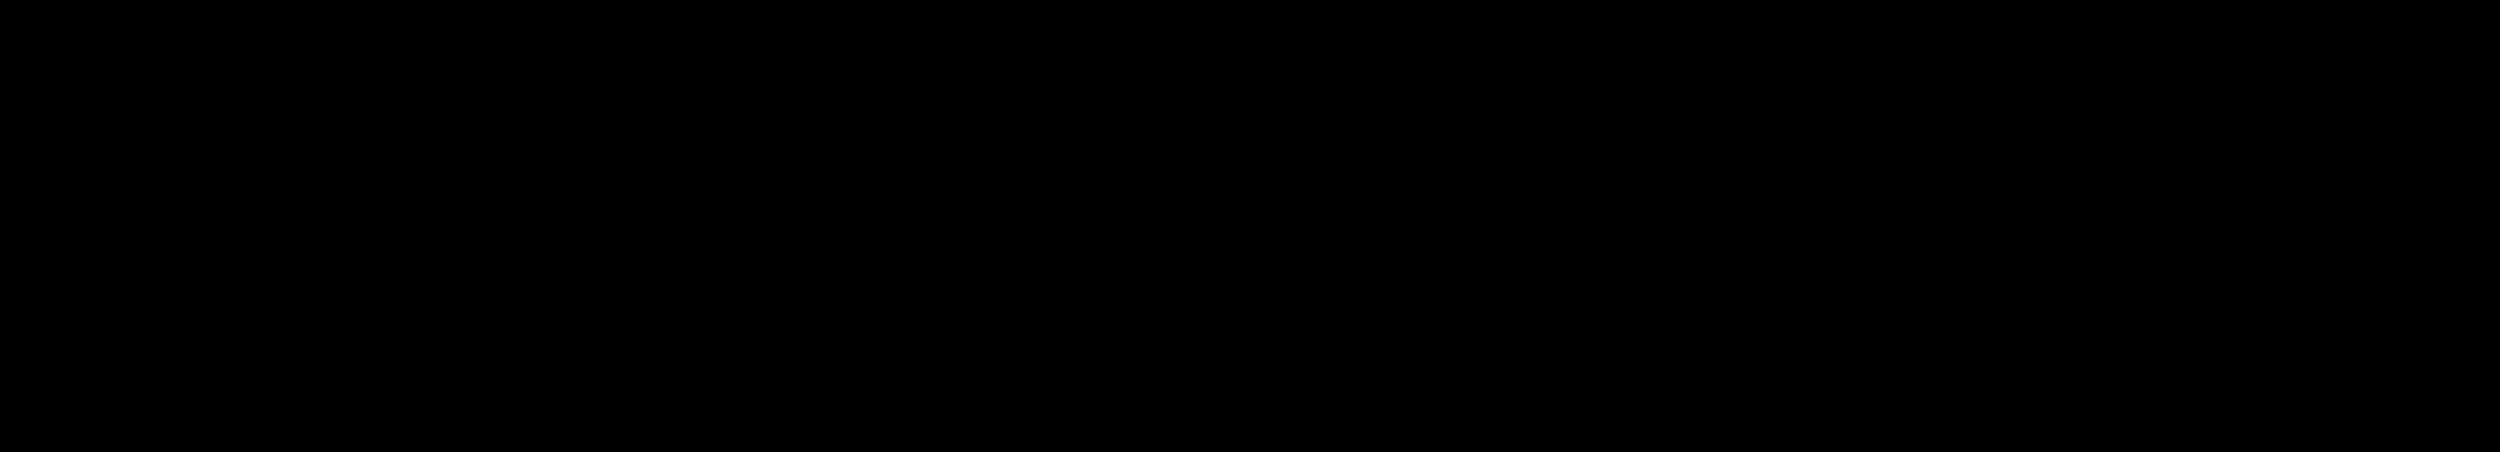 K4HCEOhMDIBT81tT3XOCOQ-Hairprint_-_New_Logo_-_MED.png